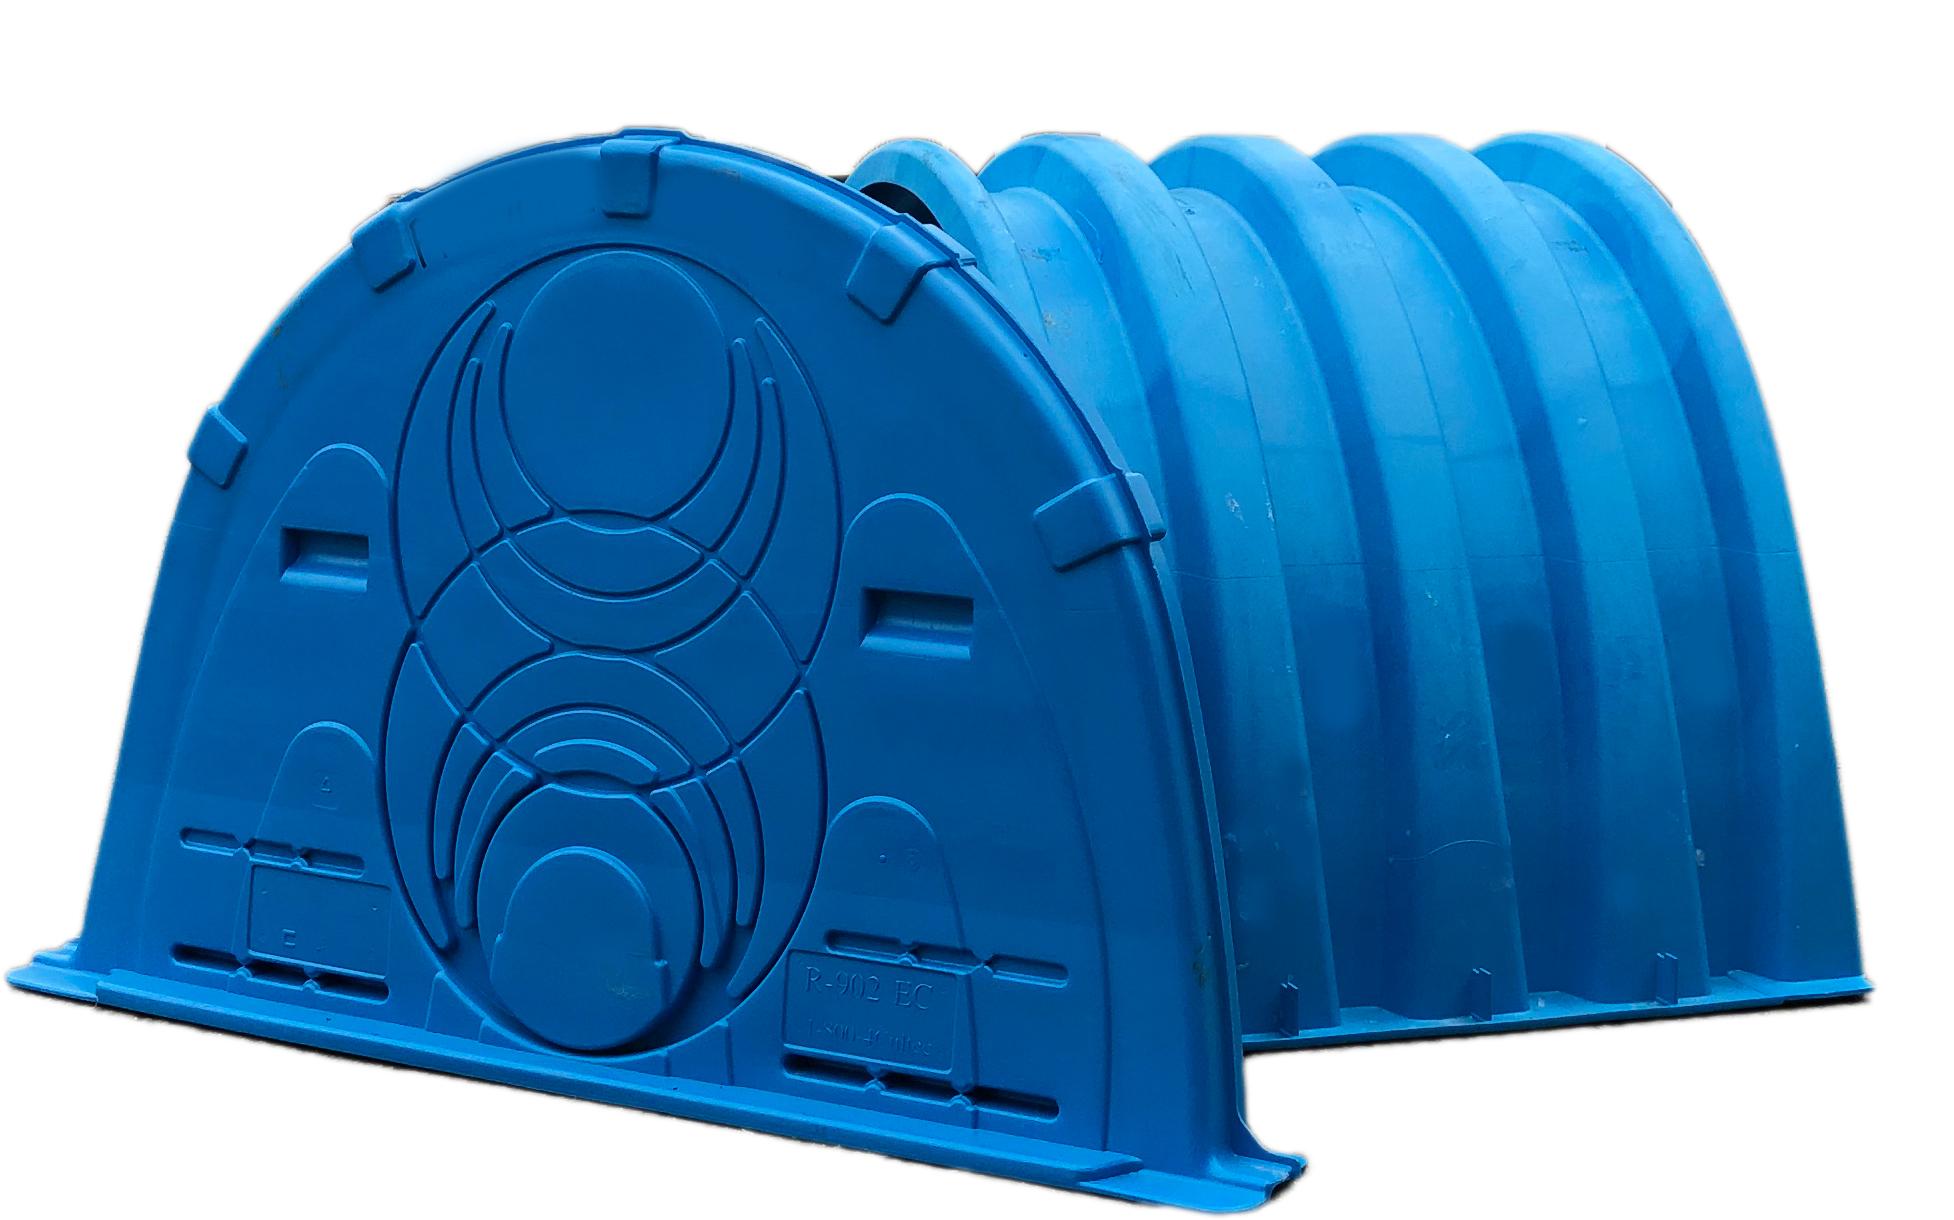 902hd-angled-left-w-end-cap-N-blue